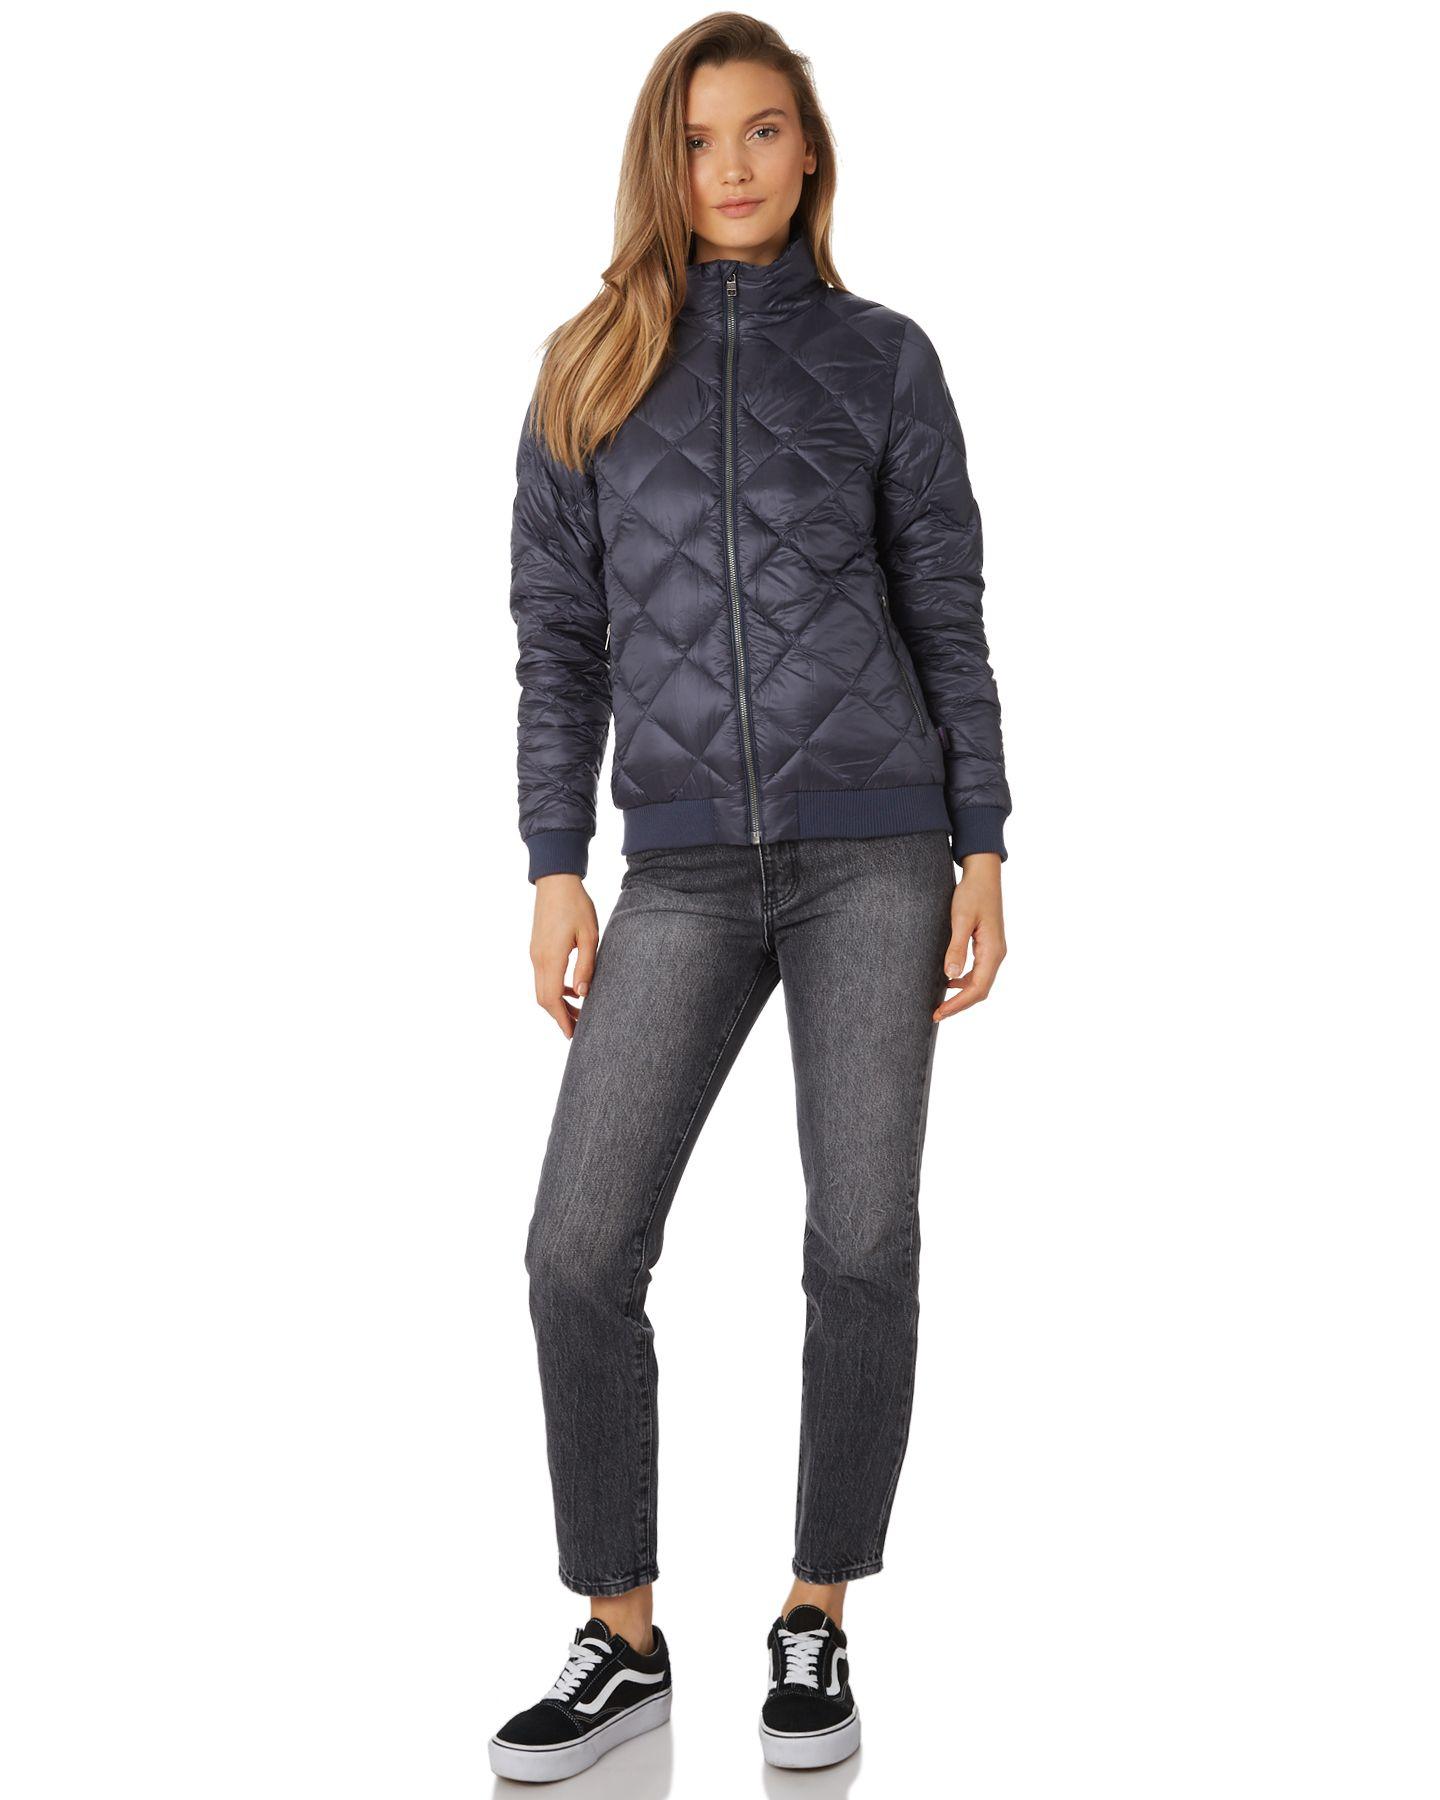 Patagonia Womens Prow Bomber Jacket Smolder Blue Surfstitch Puffer Jacket Women Coats Jackets Women Jackets For Women [ 1800 x 1440 Pixel ]